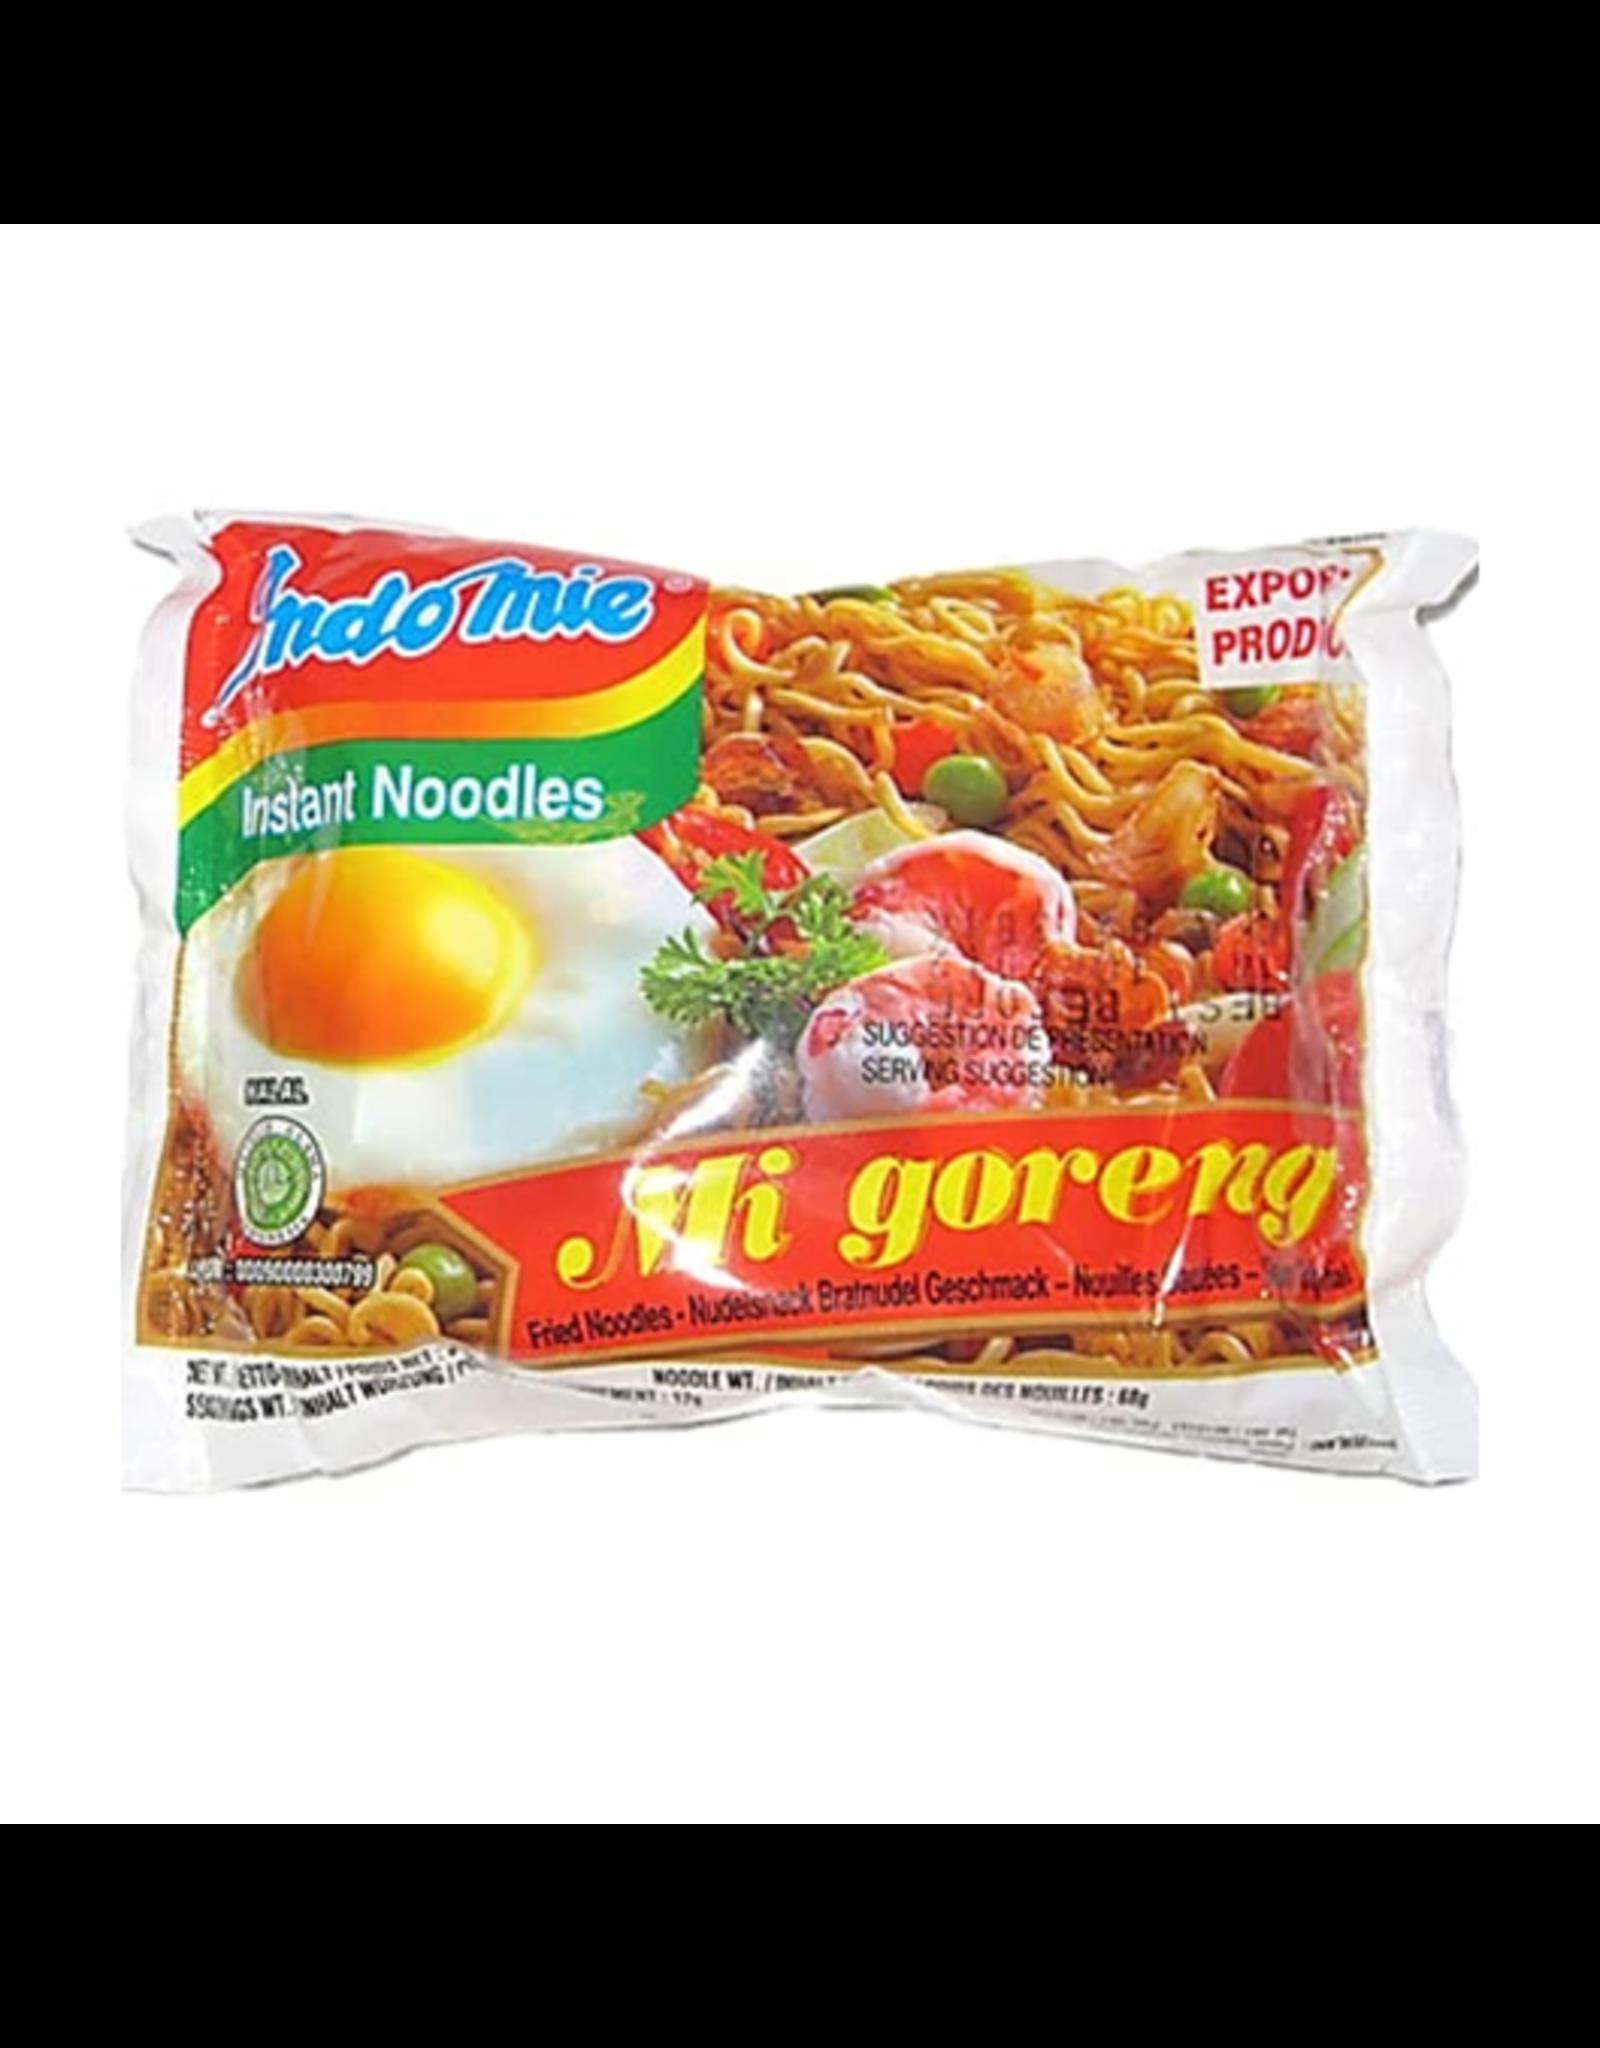 Indomie Bamisoep Mie Goreng 40 stuks